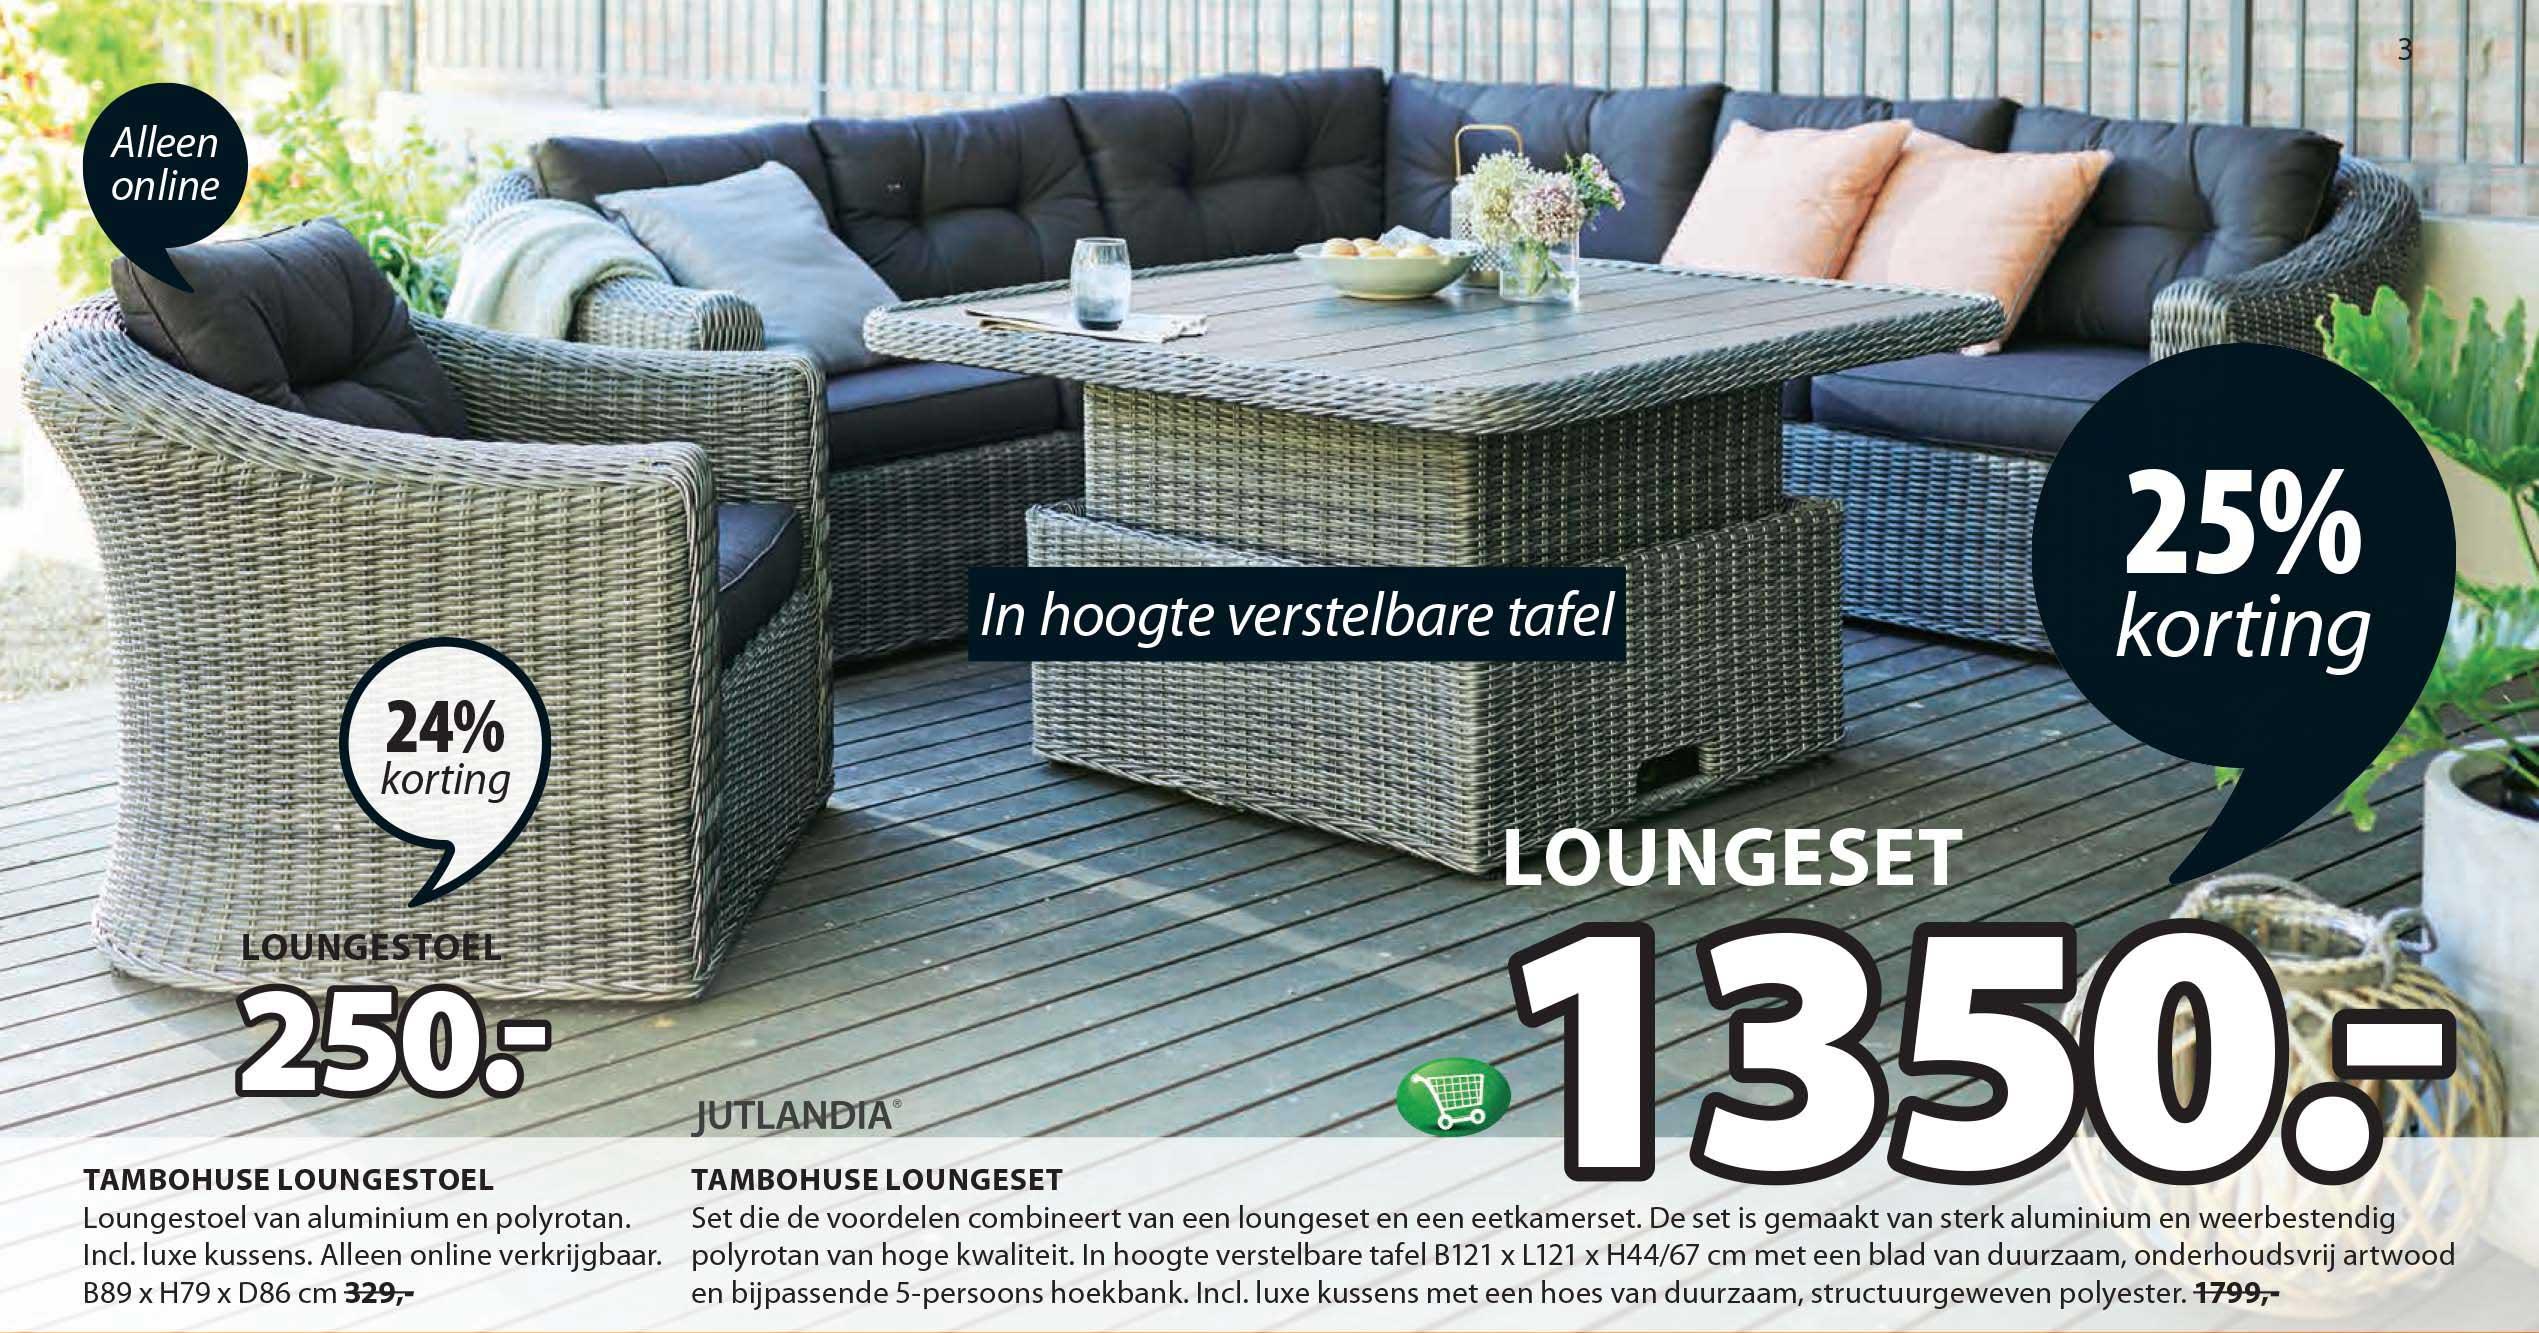 Jysk Tambohuse Loungeset: 25% Korting